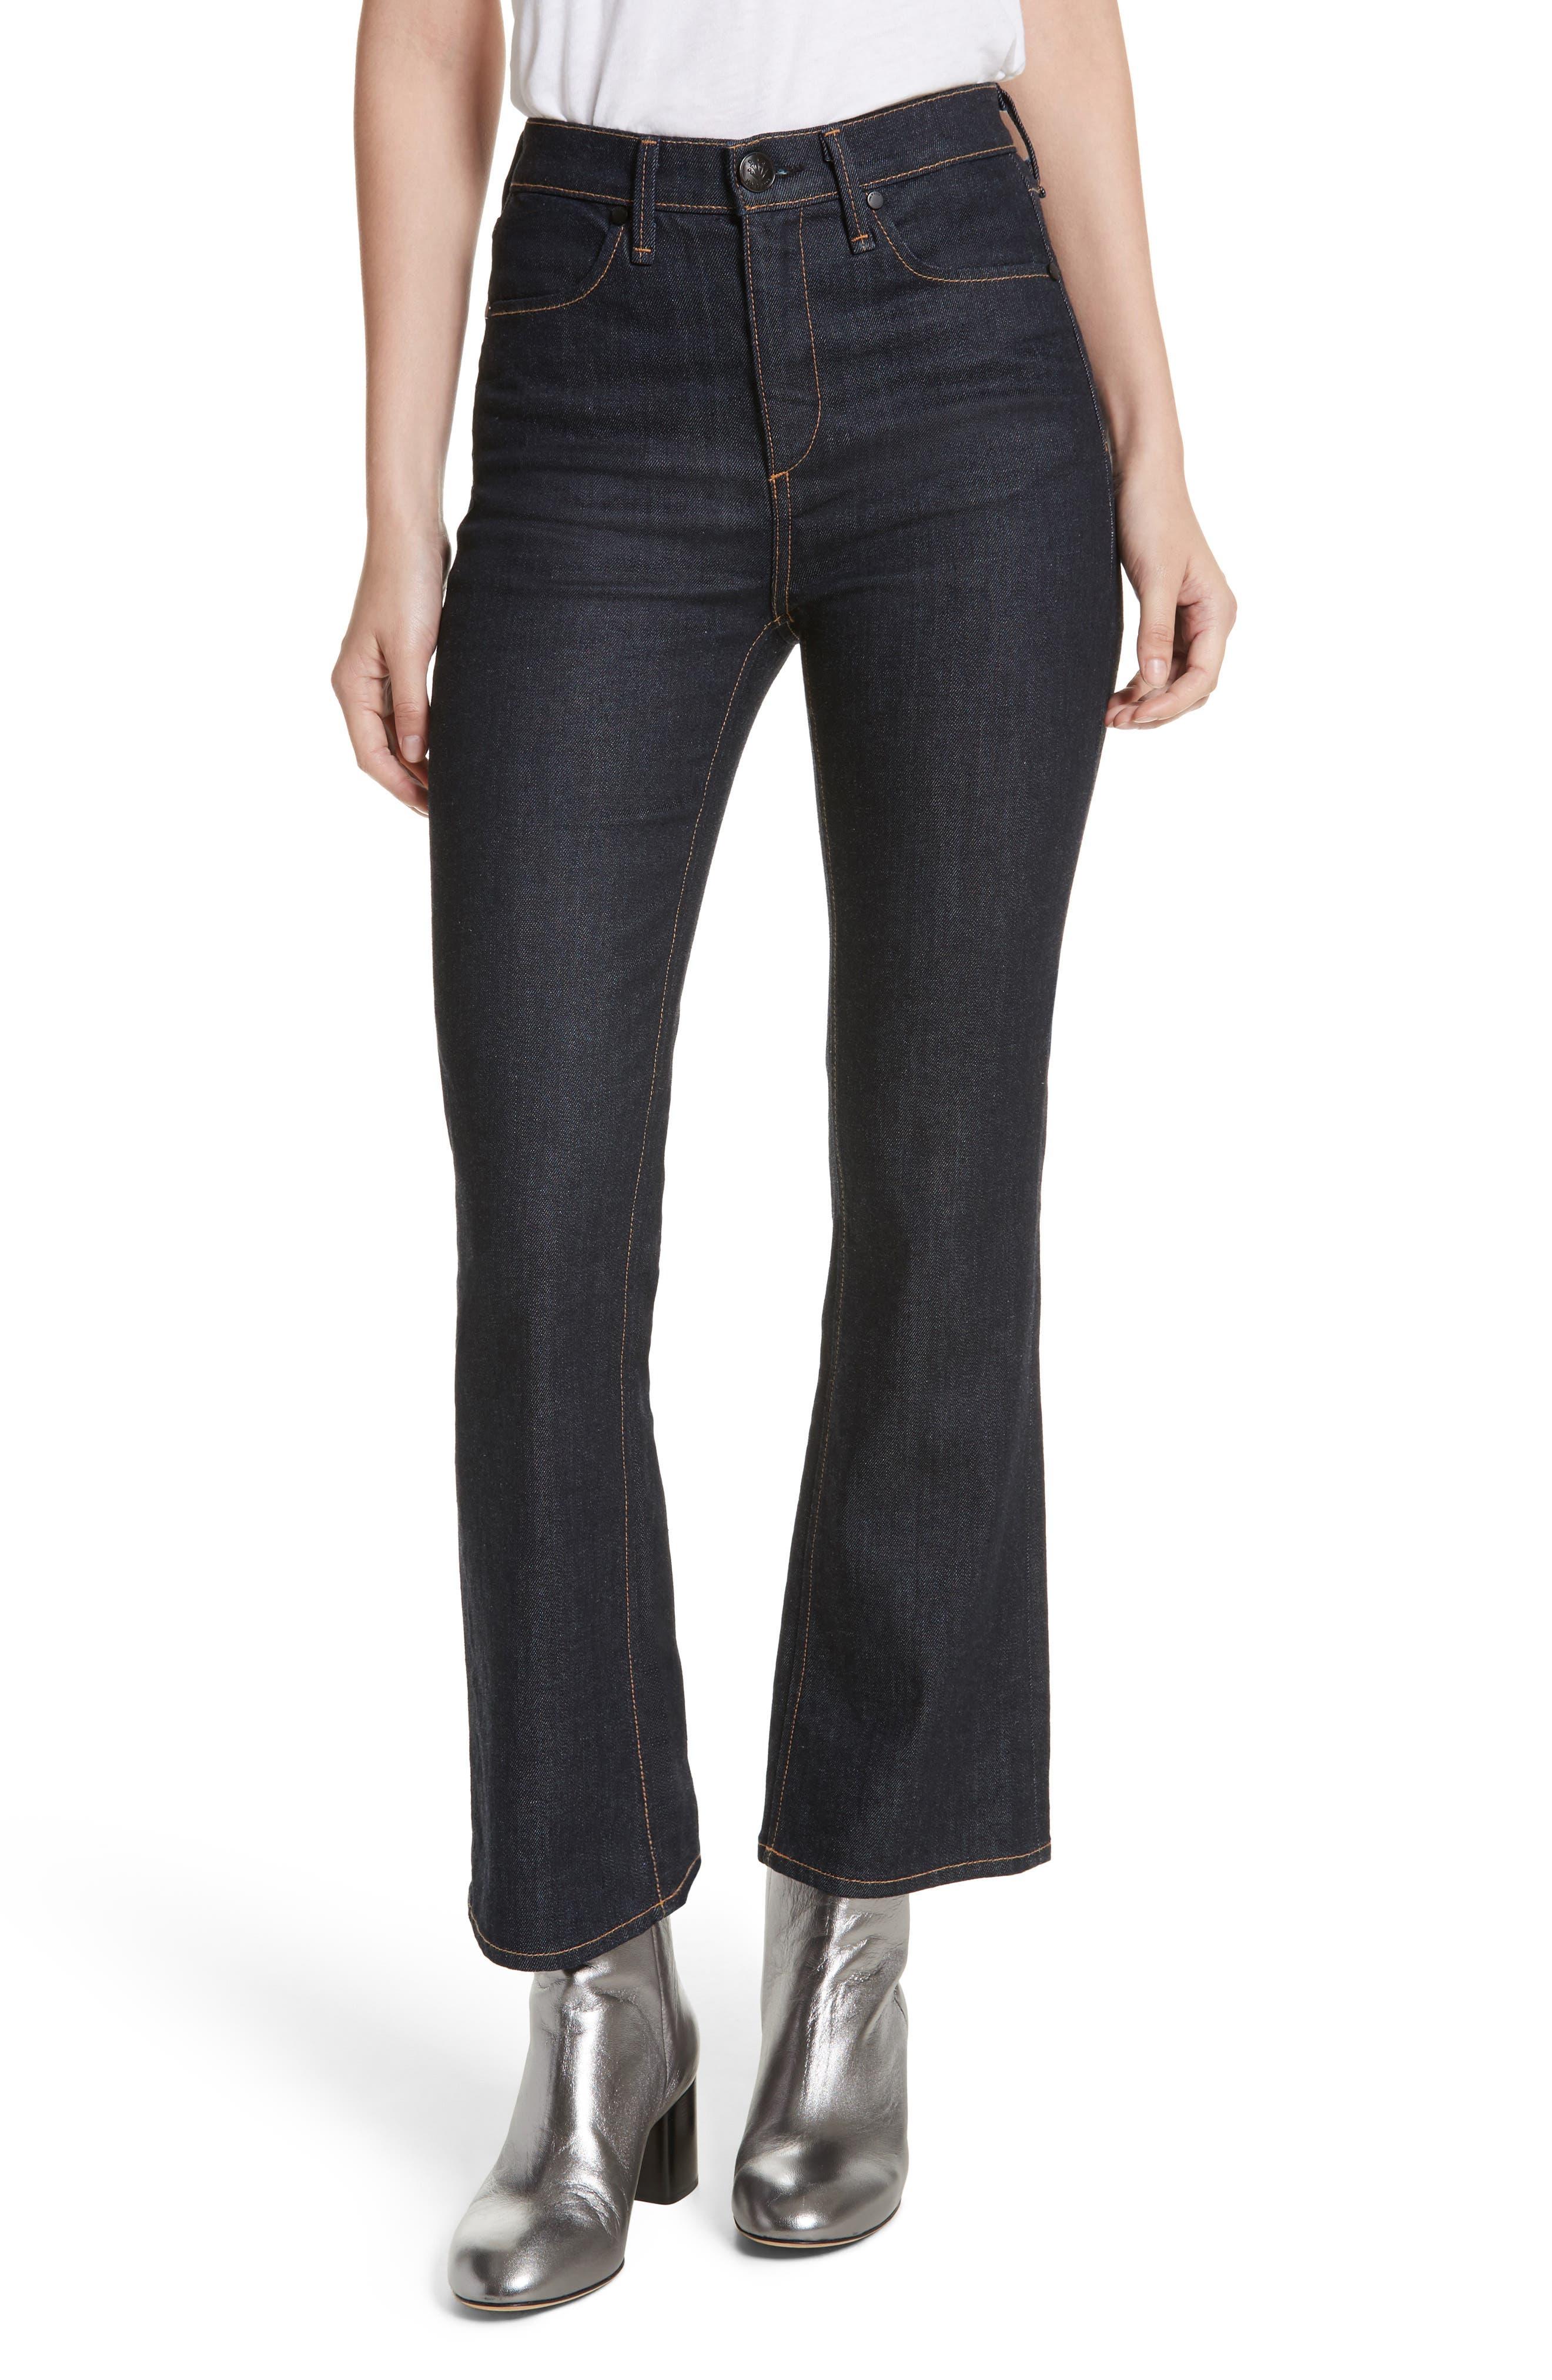 Main Image - rag & bone/JEANS Dylan High Waist Kick Flare Jeans